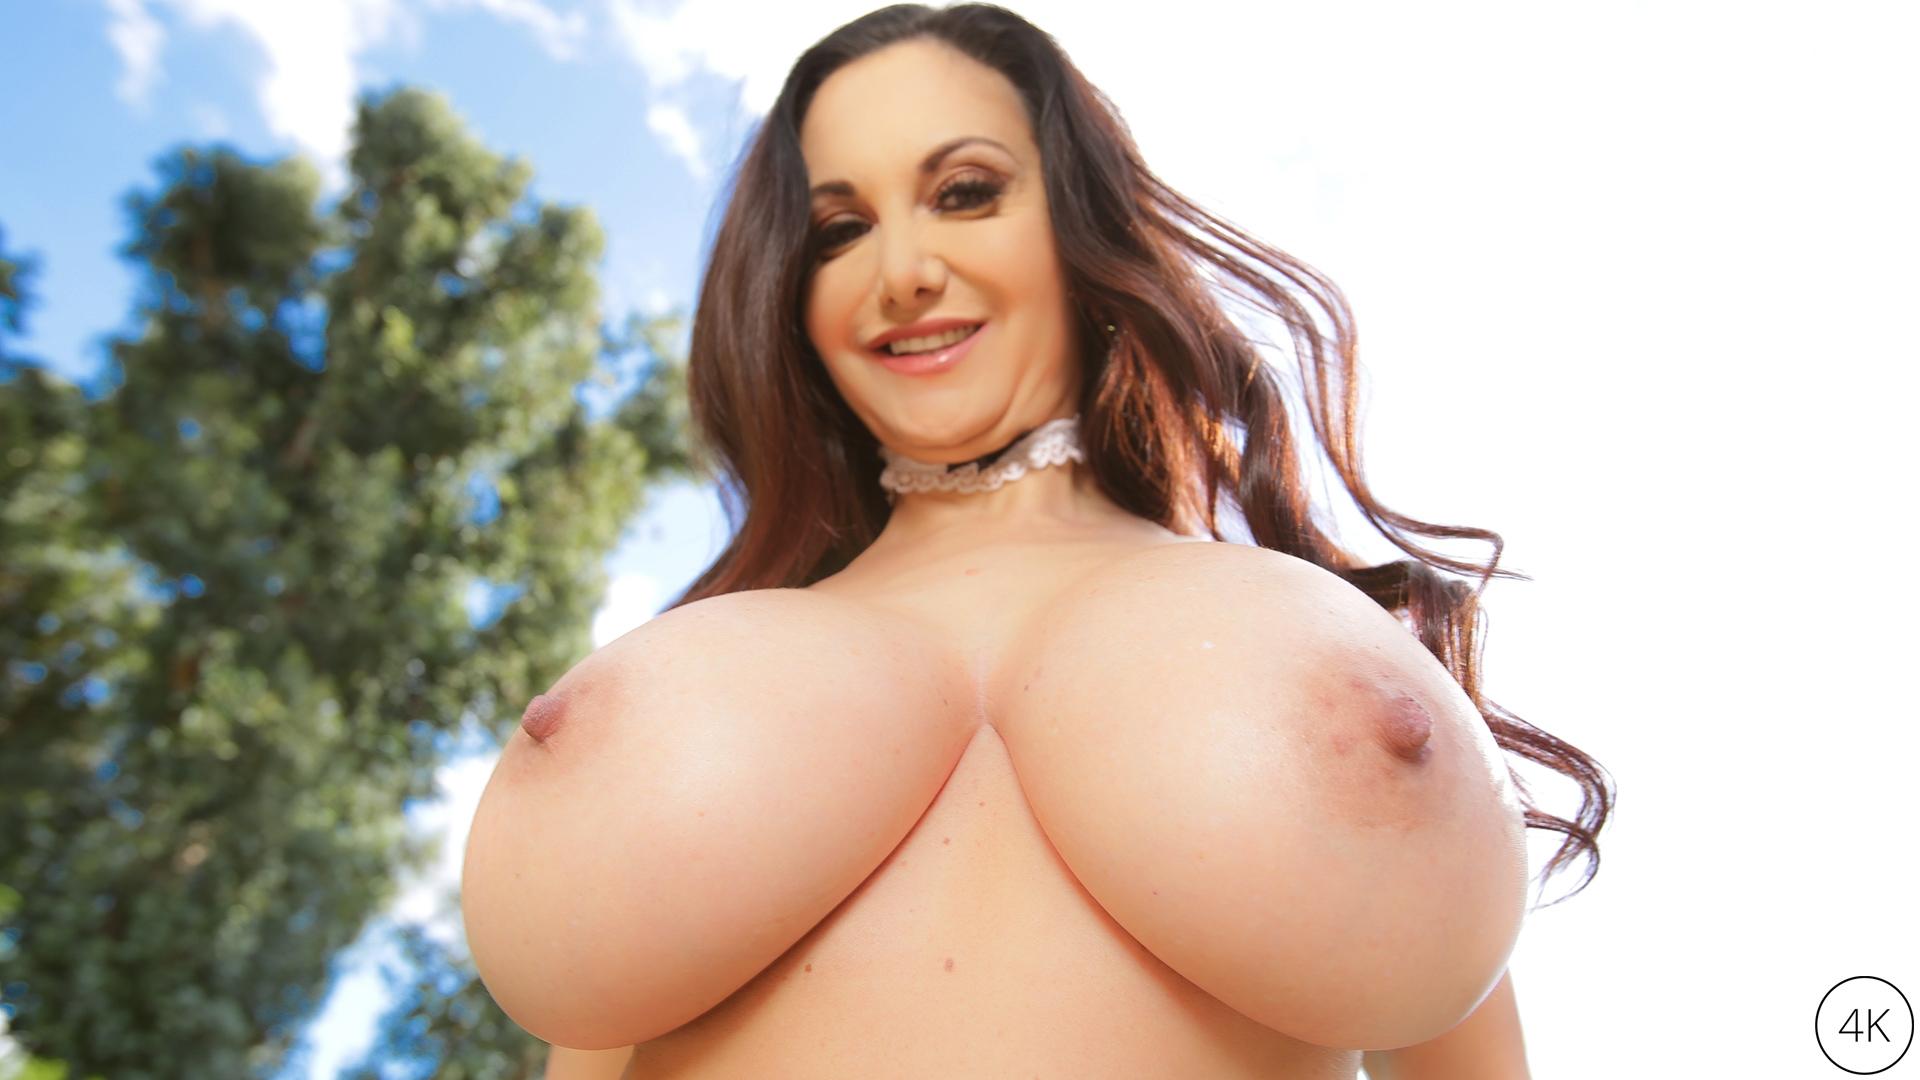 Download JulesJordan.com - Ava Addams, Ho Ho Ho Santa Brought Me Big Titties For Christmas